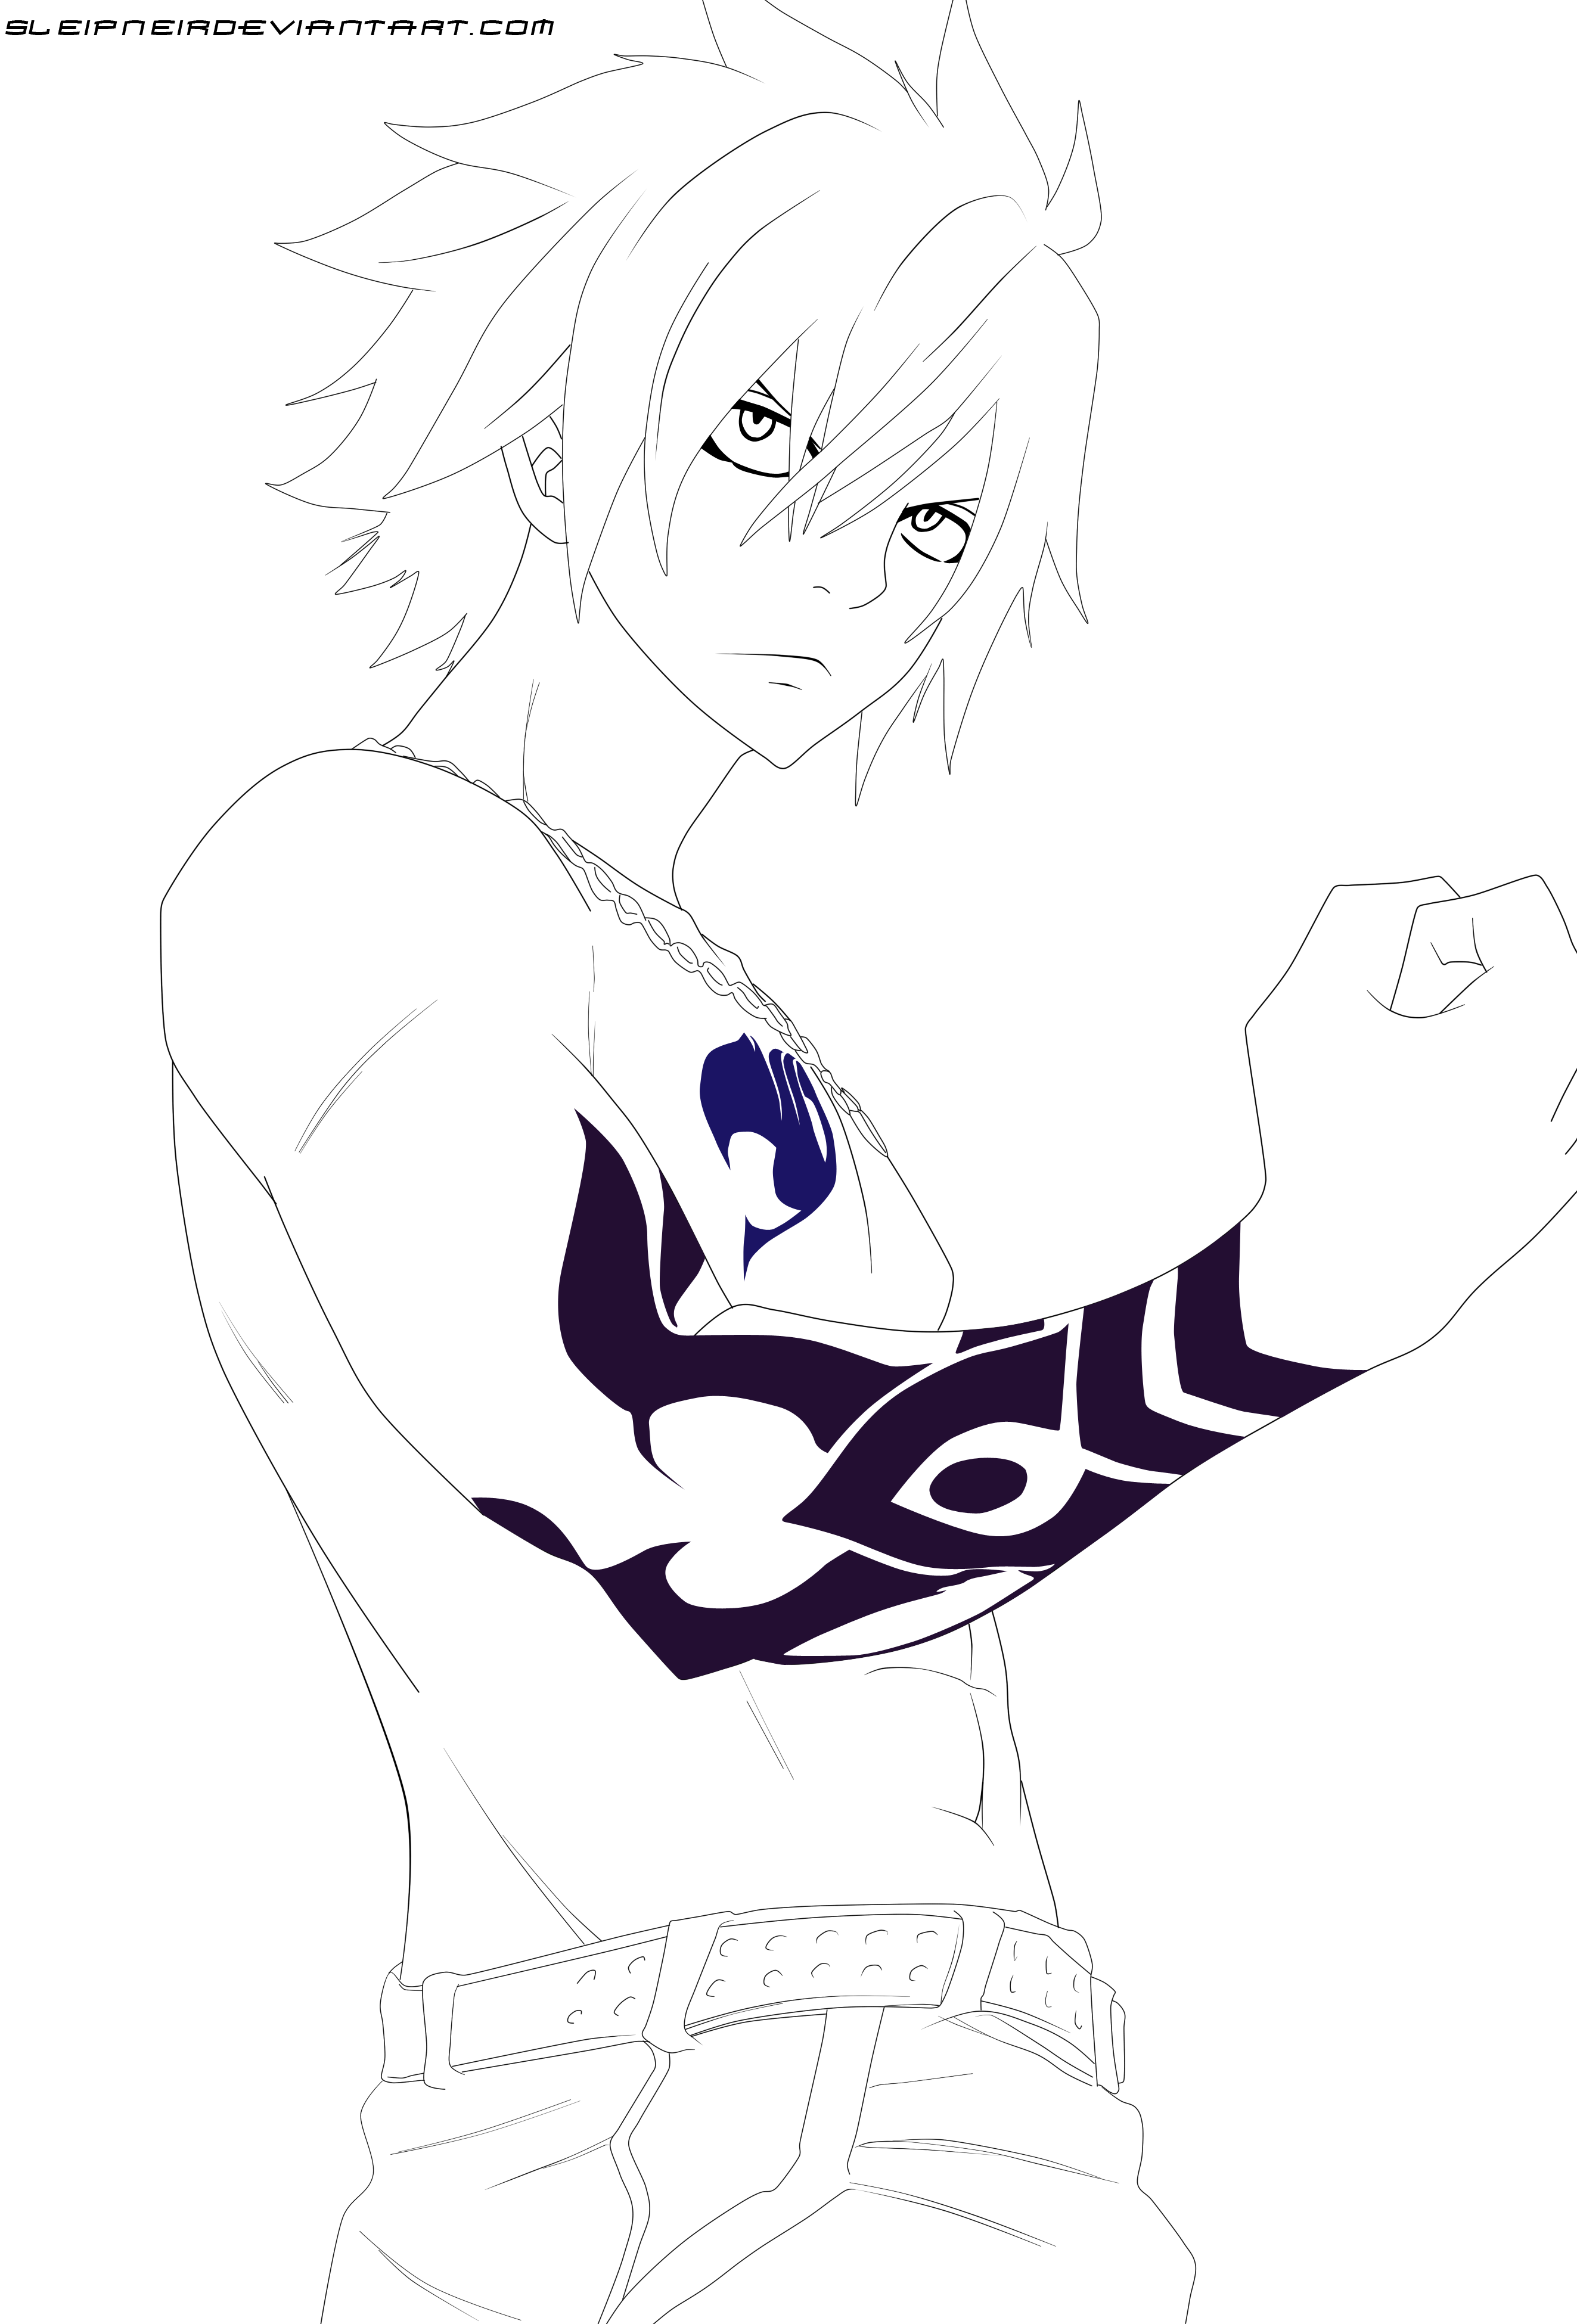 Gray Fairy Tail 394 By Sleipneir On Deviantart Fairy Tail Anime Fairy Tail Art Fairy Tail Tattoo